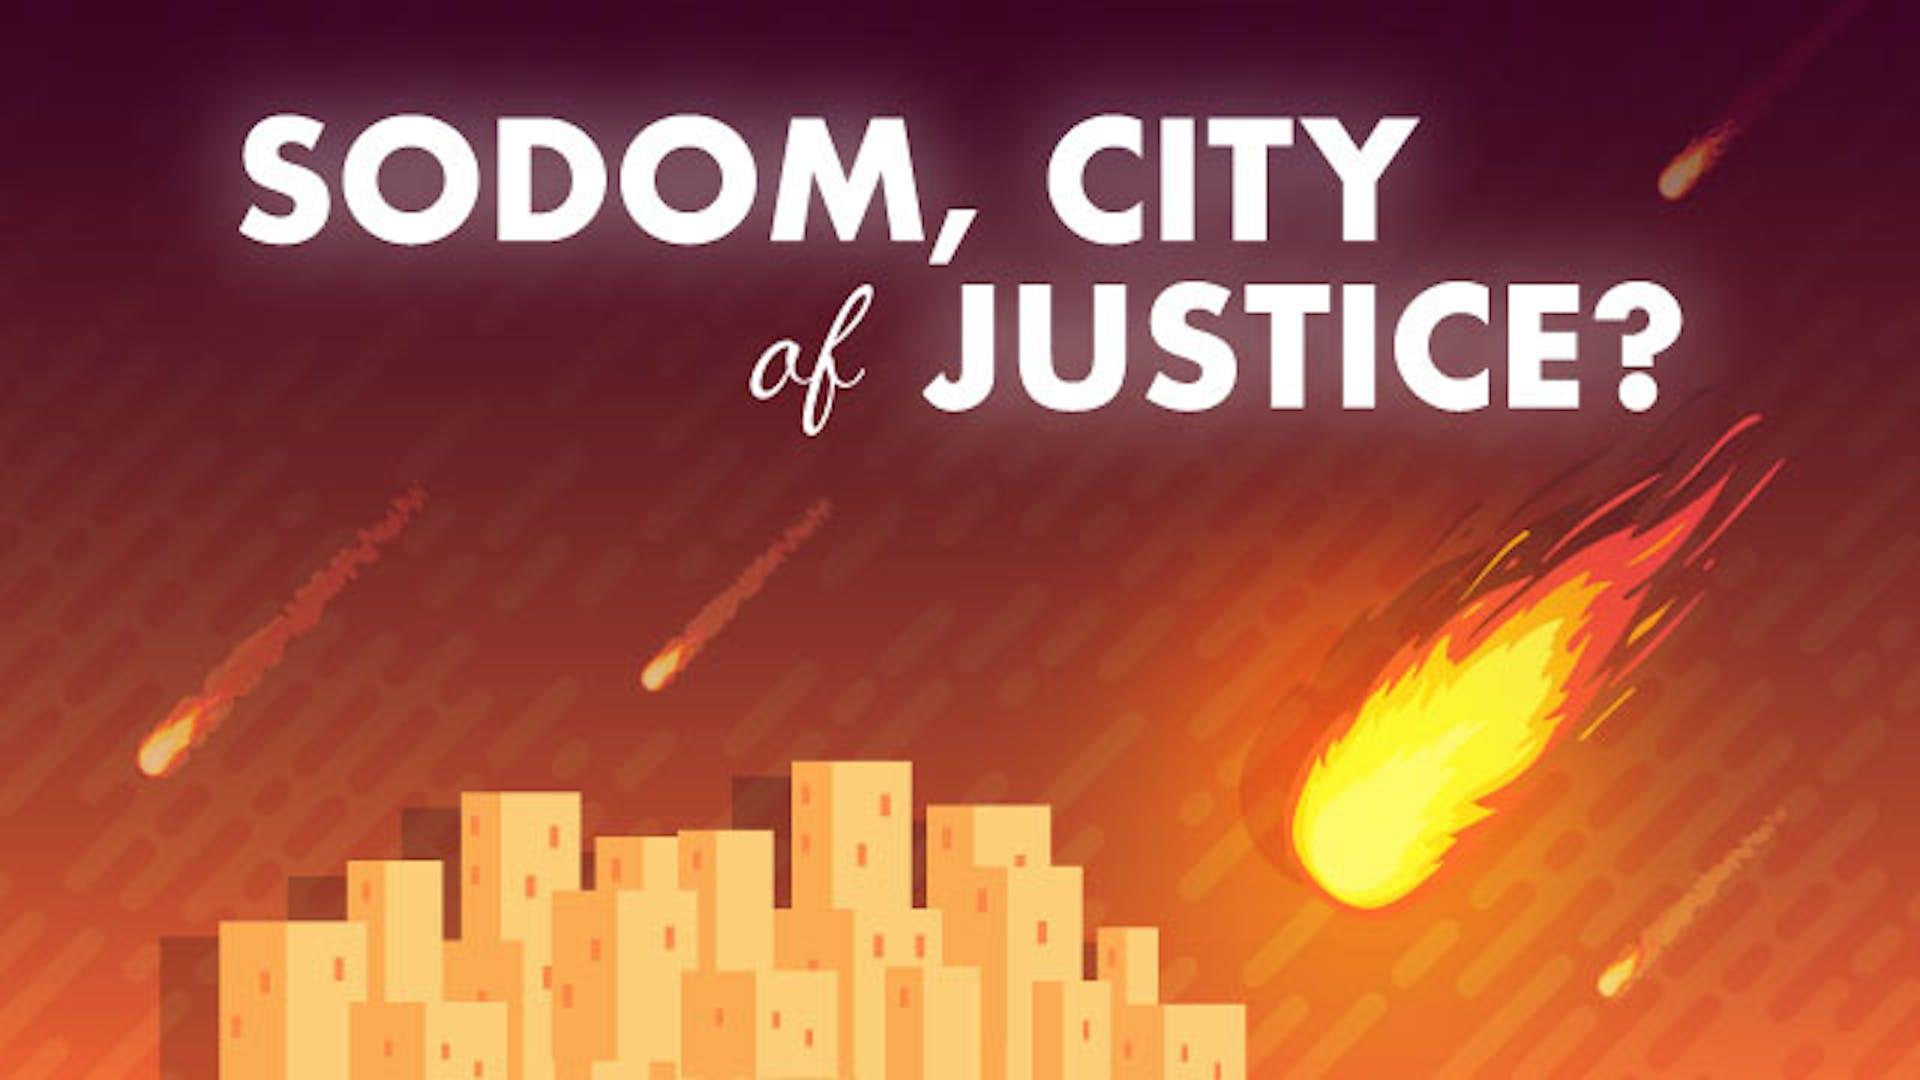 What was real sin Sodom Gomorrah